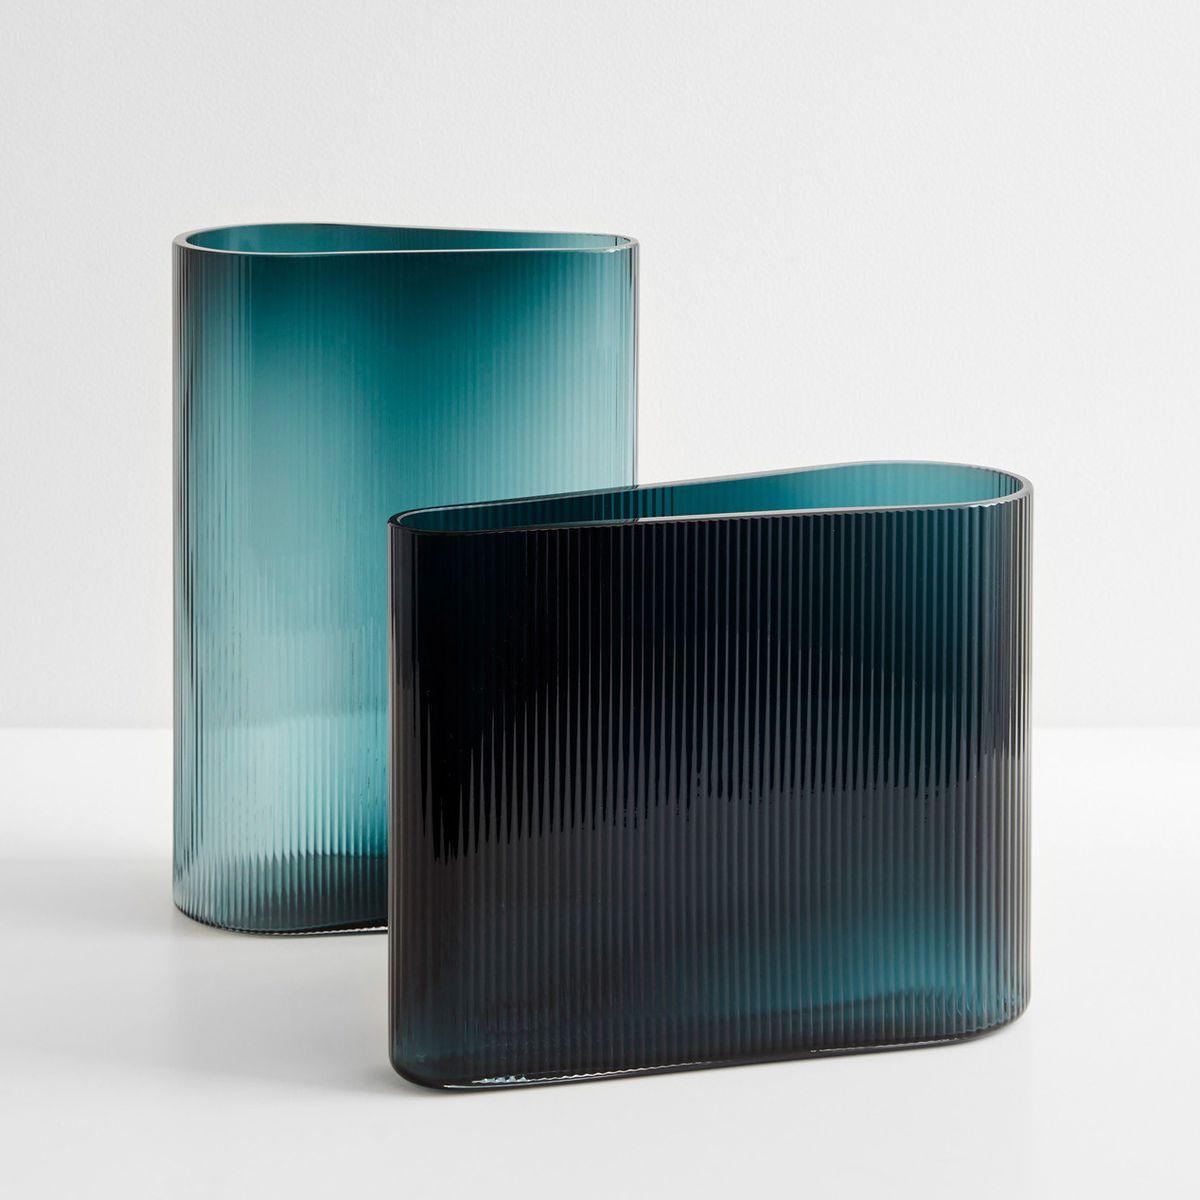 Two pieces of glassware in a dark blue color.